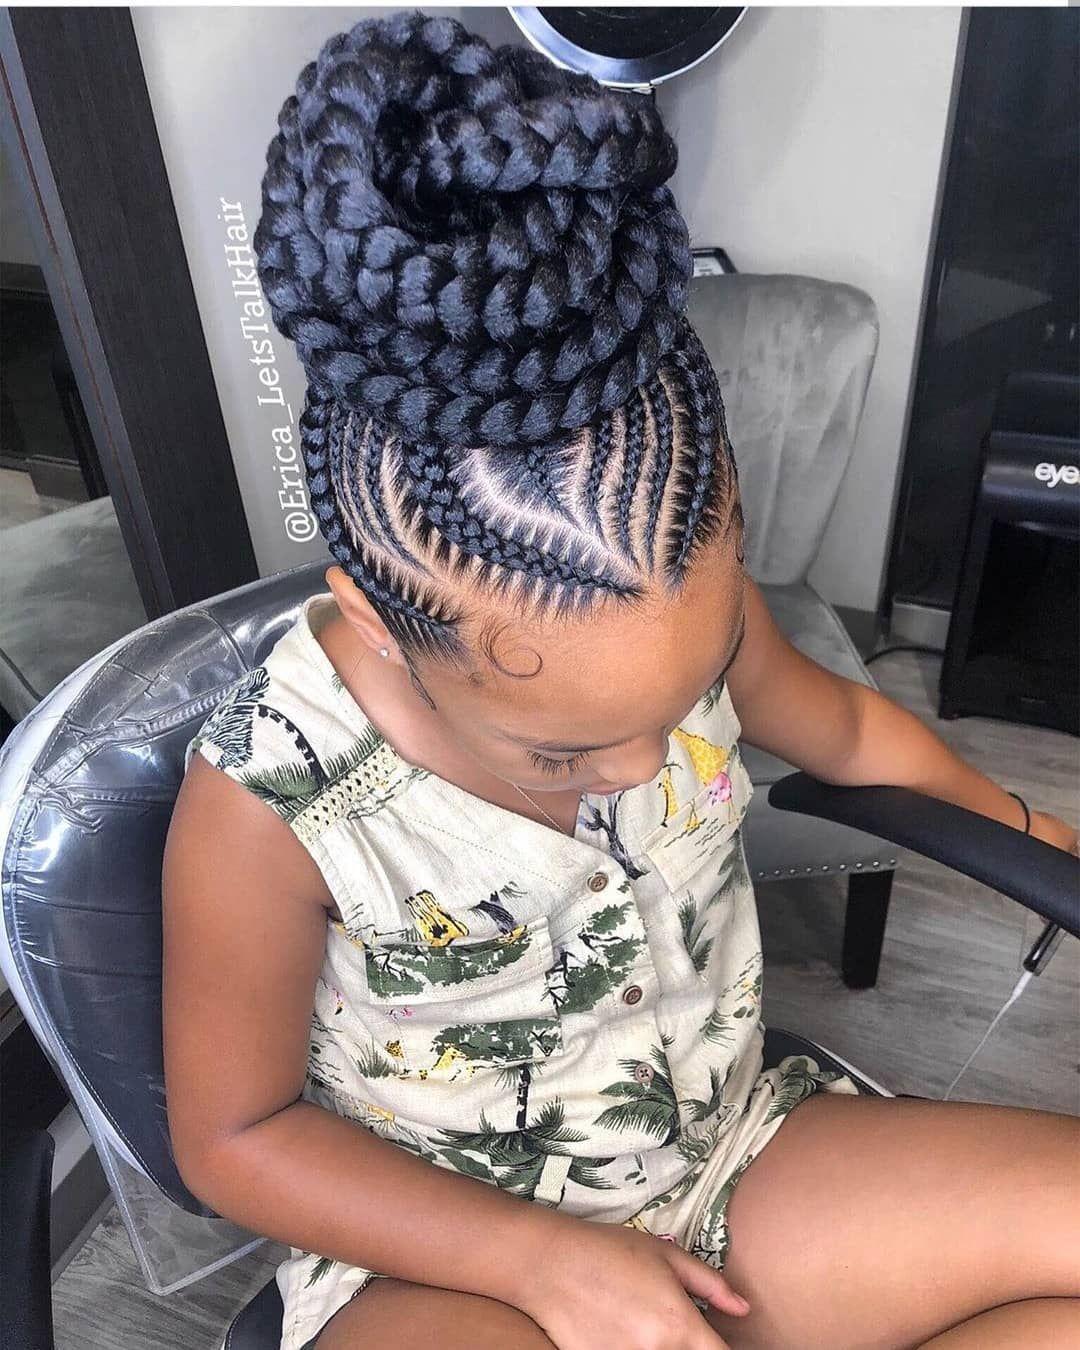 2021 Black Braided Hairstyles For Ladies 45 Most Trendy Hairstyles